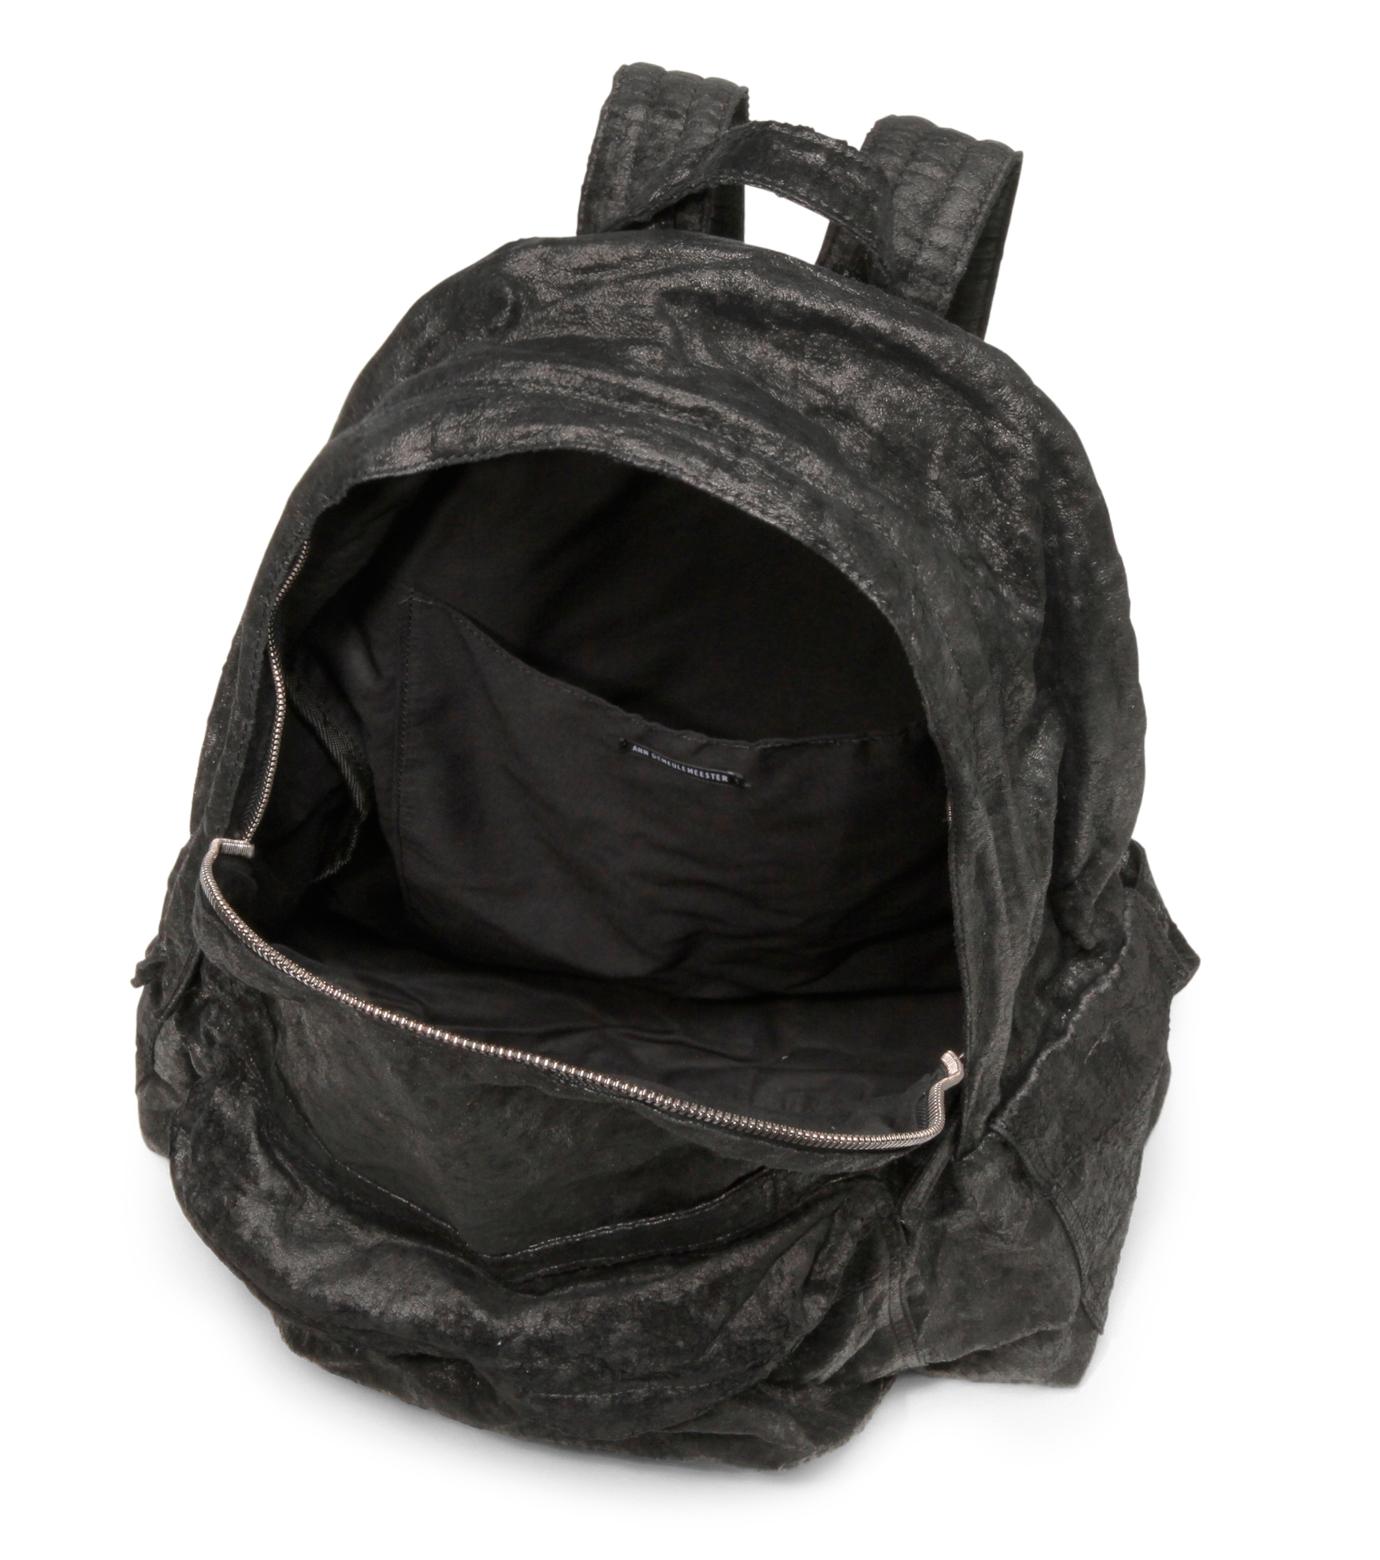 Ann Demeulemeester(アン ドゥムルメステール)のBack pack-BLACK-2102922008-13 拡大詳細画像4